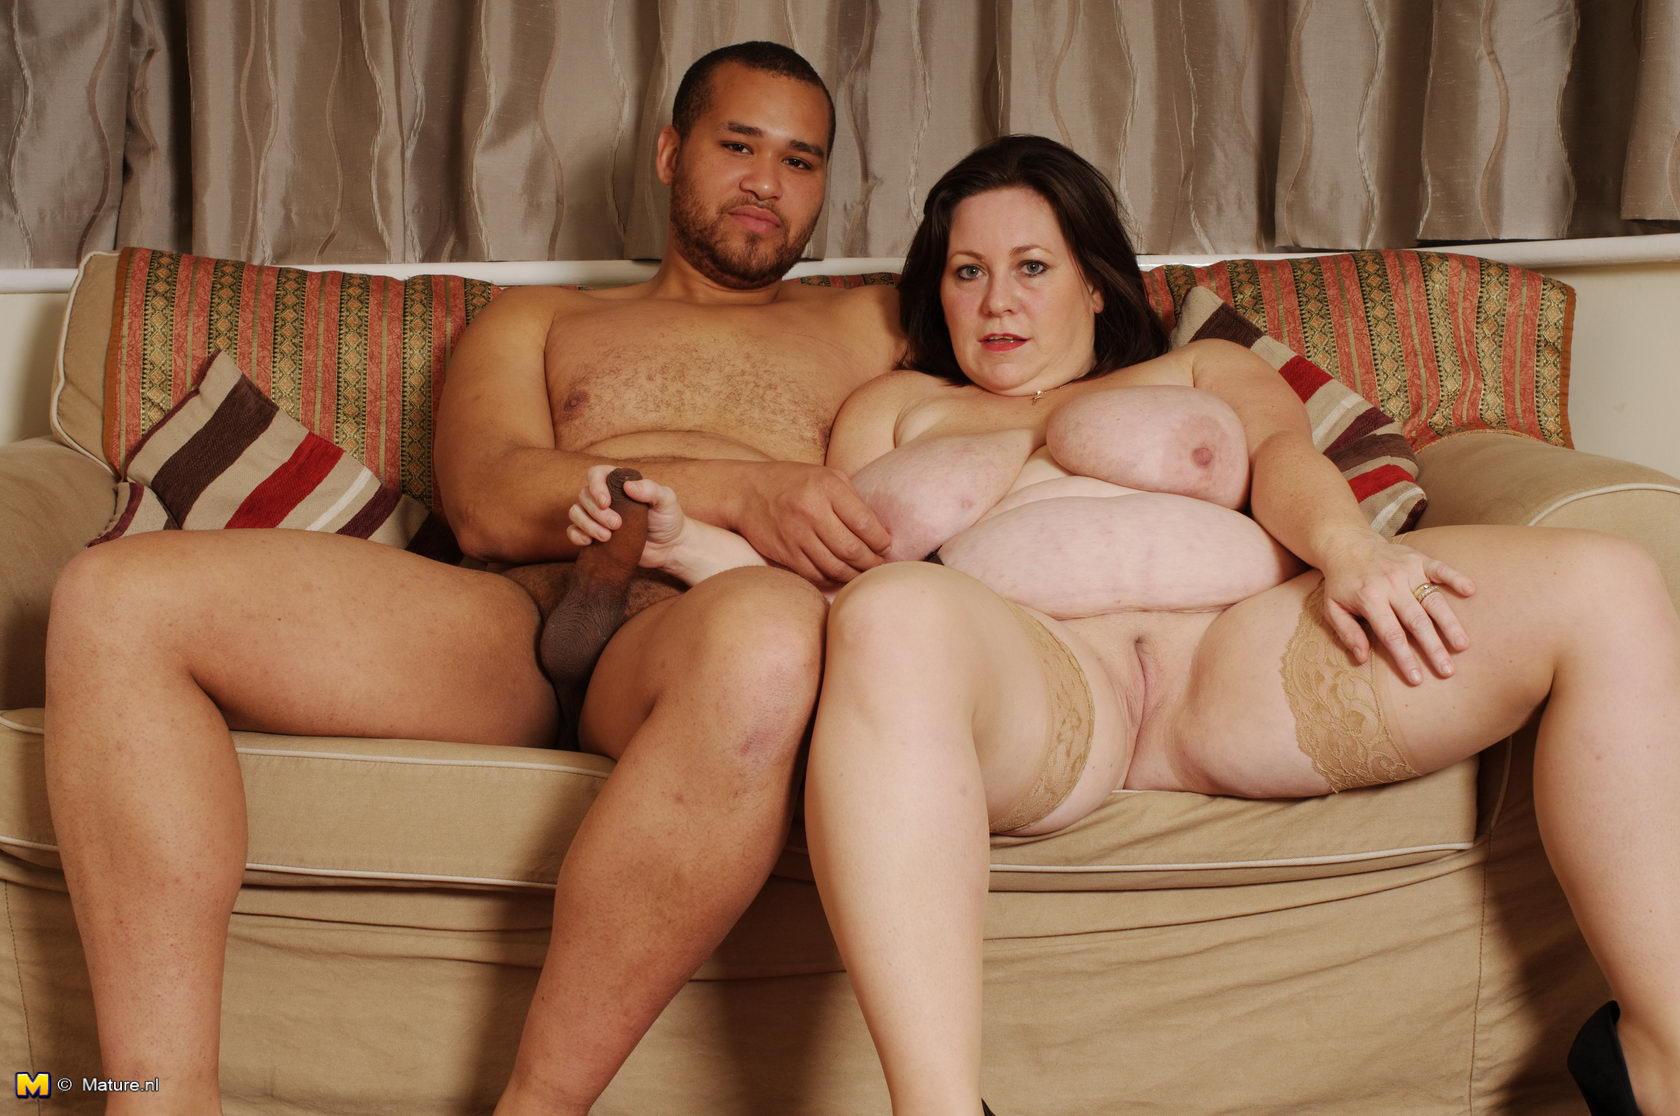 Секс тетками онлайн 4 фотография